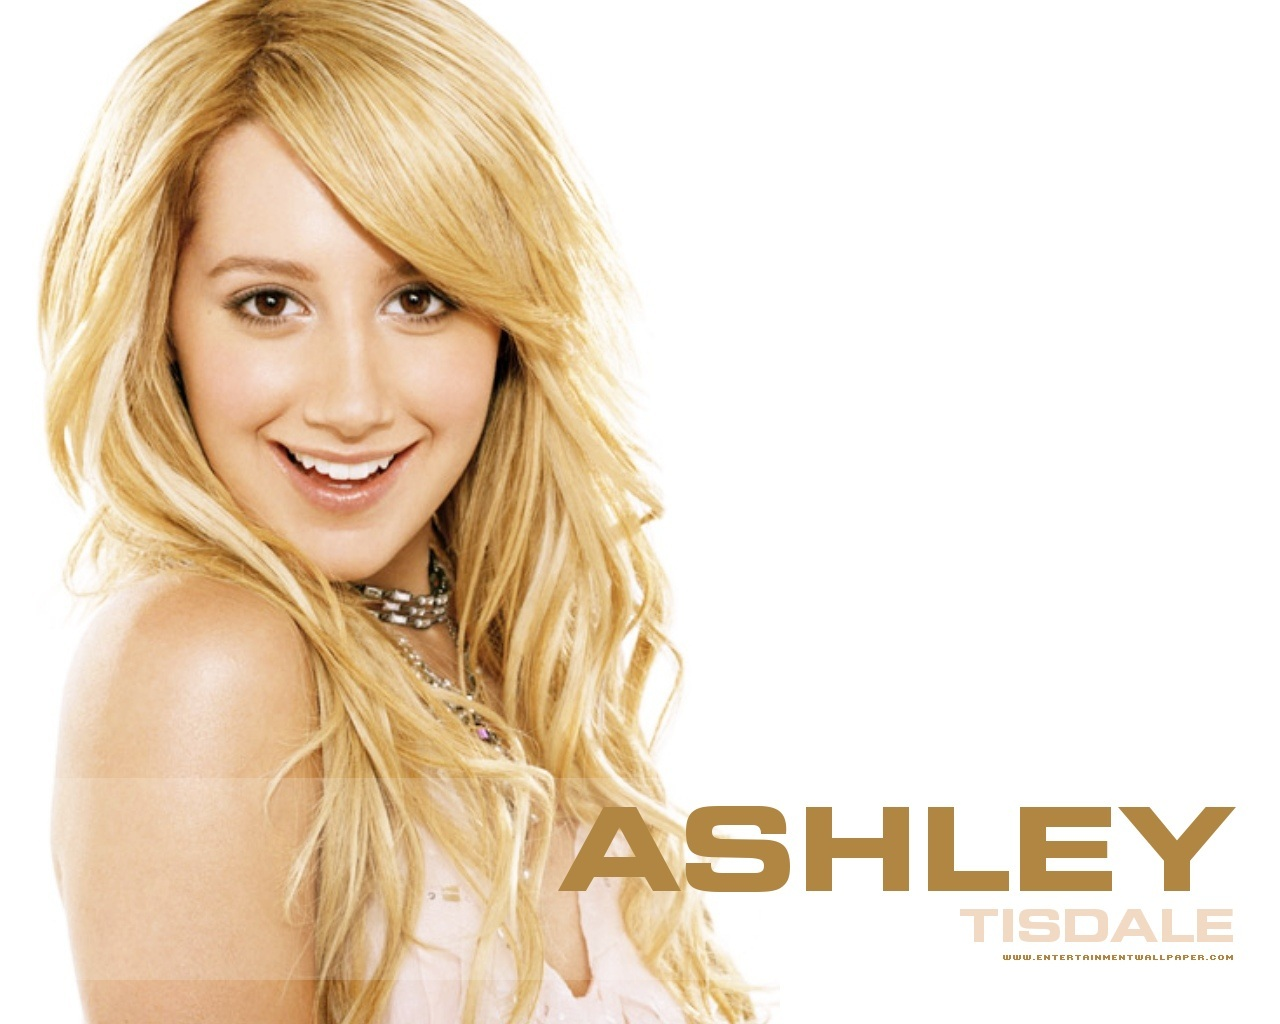 http://1.bp.blogspot.com/-ji2tbkPLozc/TtOA-2kKM4I/AAAAAAAAA6I/pbyCoxc0WoM/s1600/Beautiful-Ashley-Tisdale-hd+Wallpapers.jpg